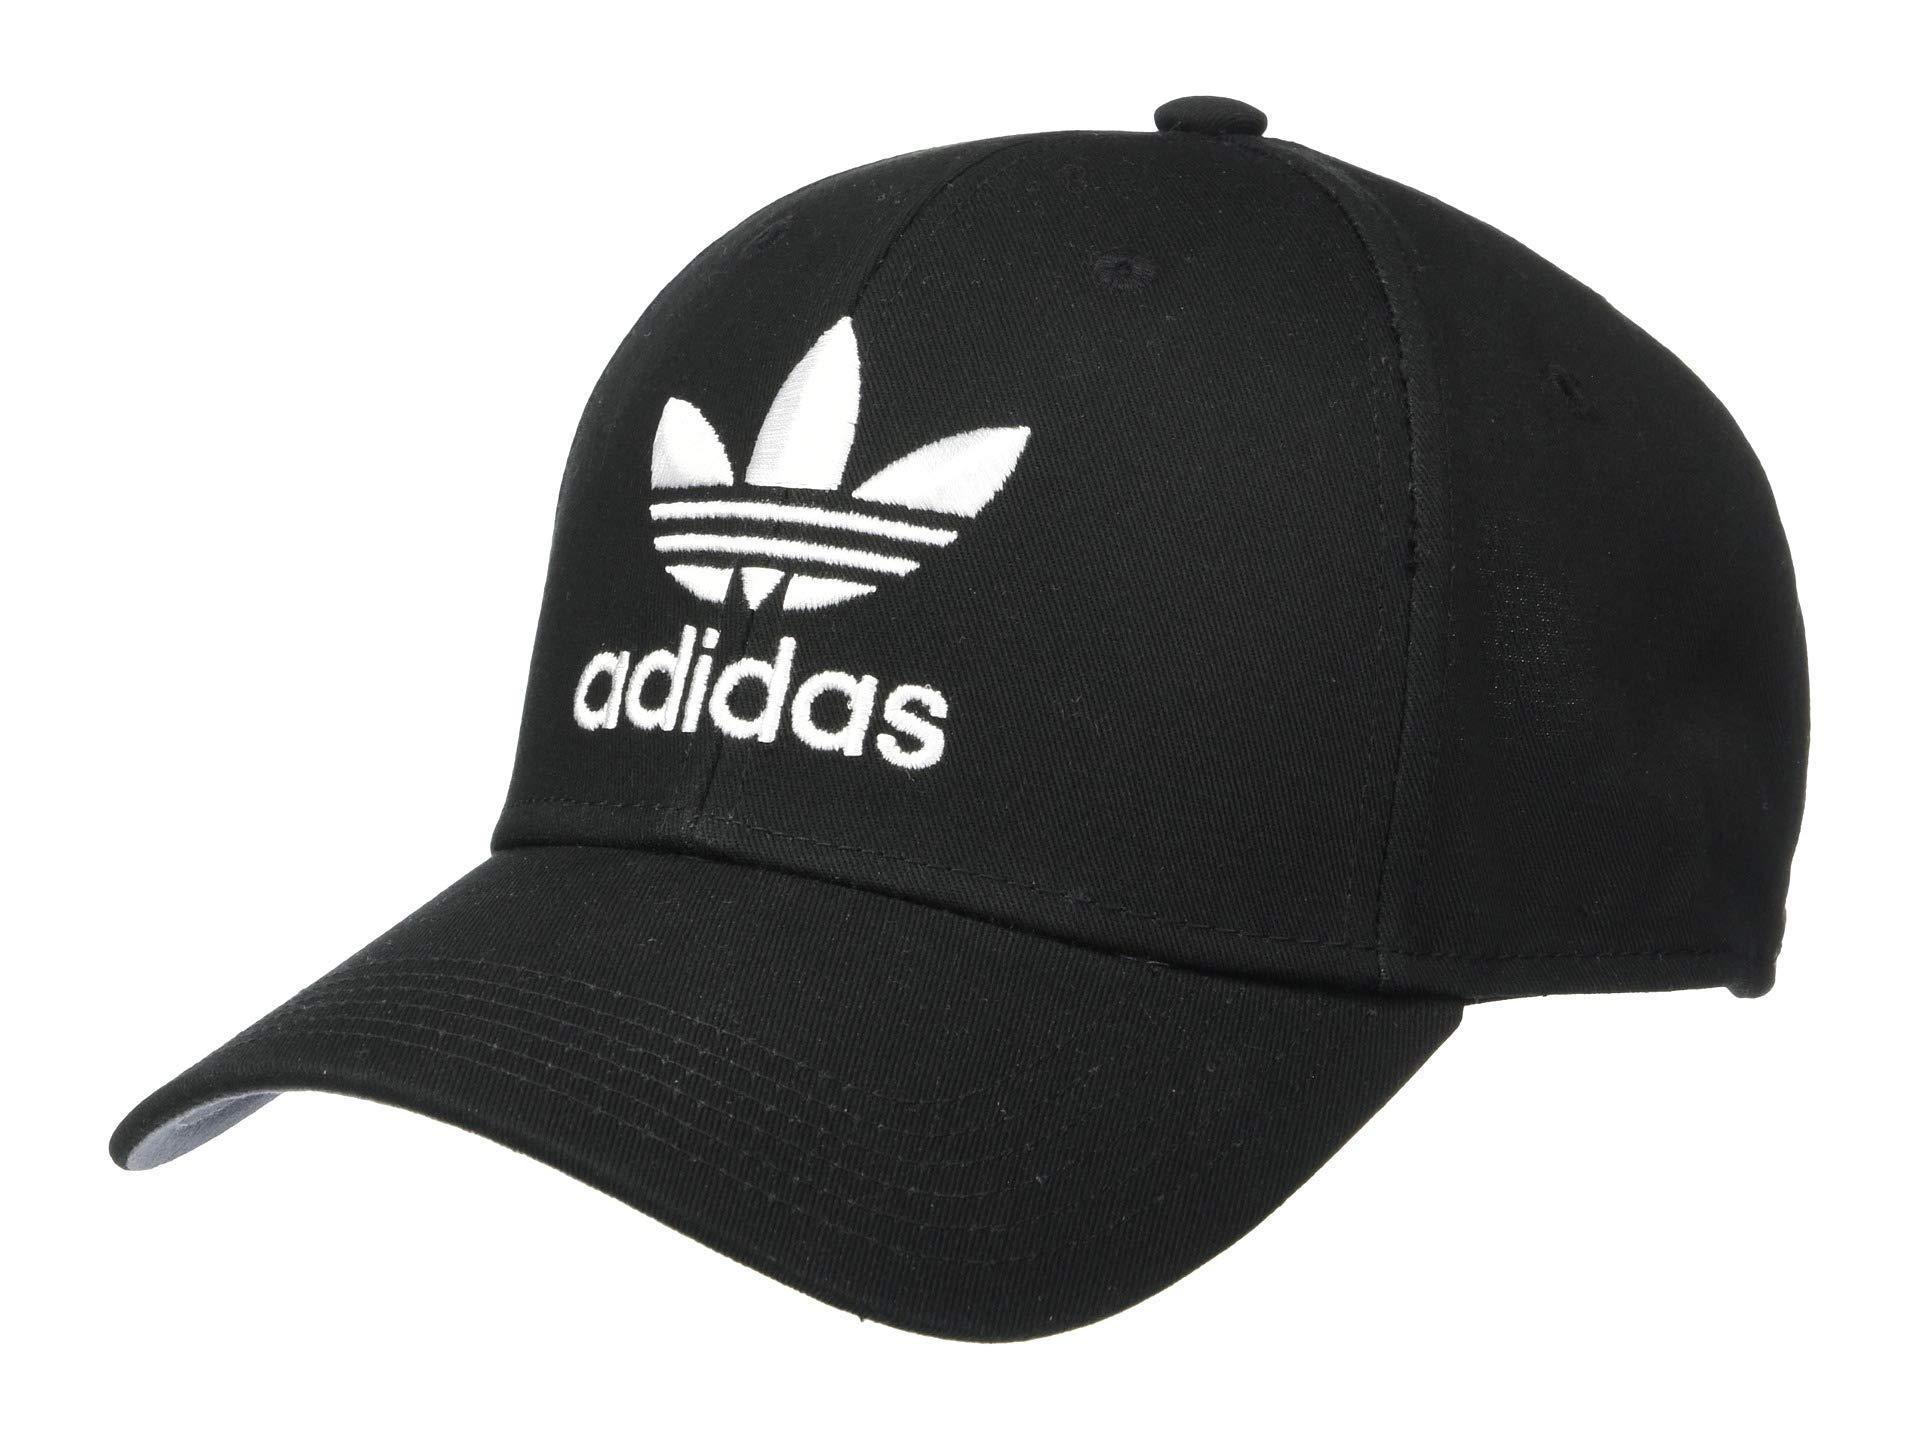 0f883937789 Adidas Originals - Trefoil Snapback In Black Bk7324 for Men - Lyst. View  fullscreen